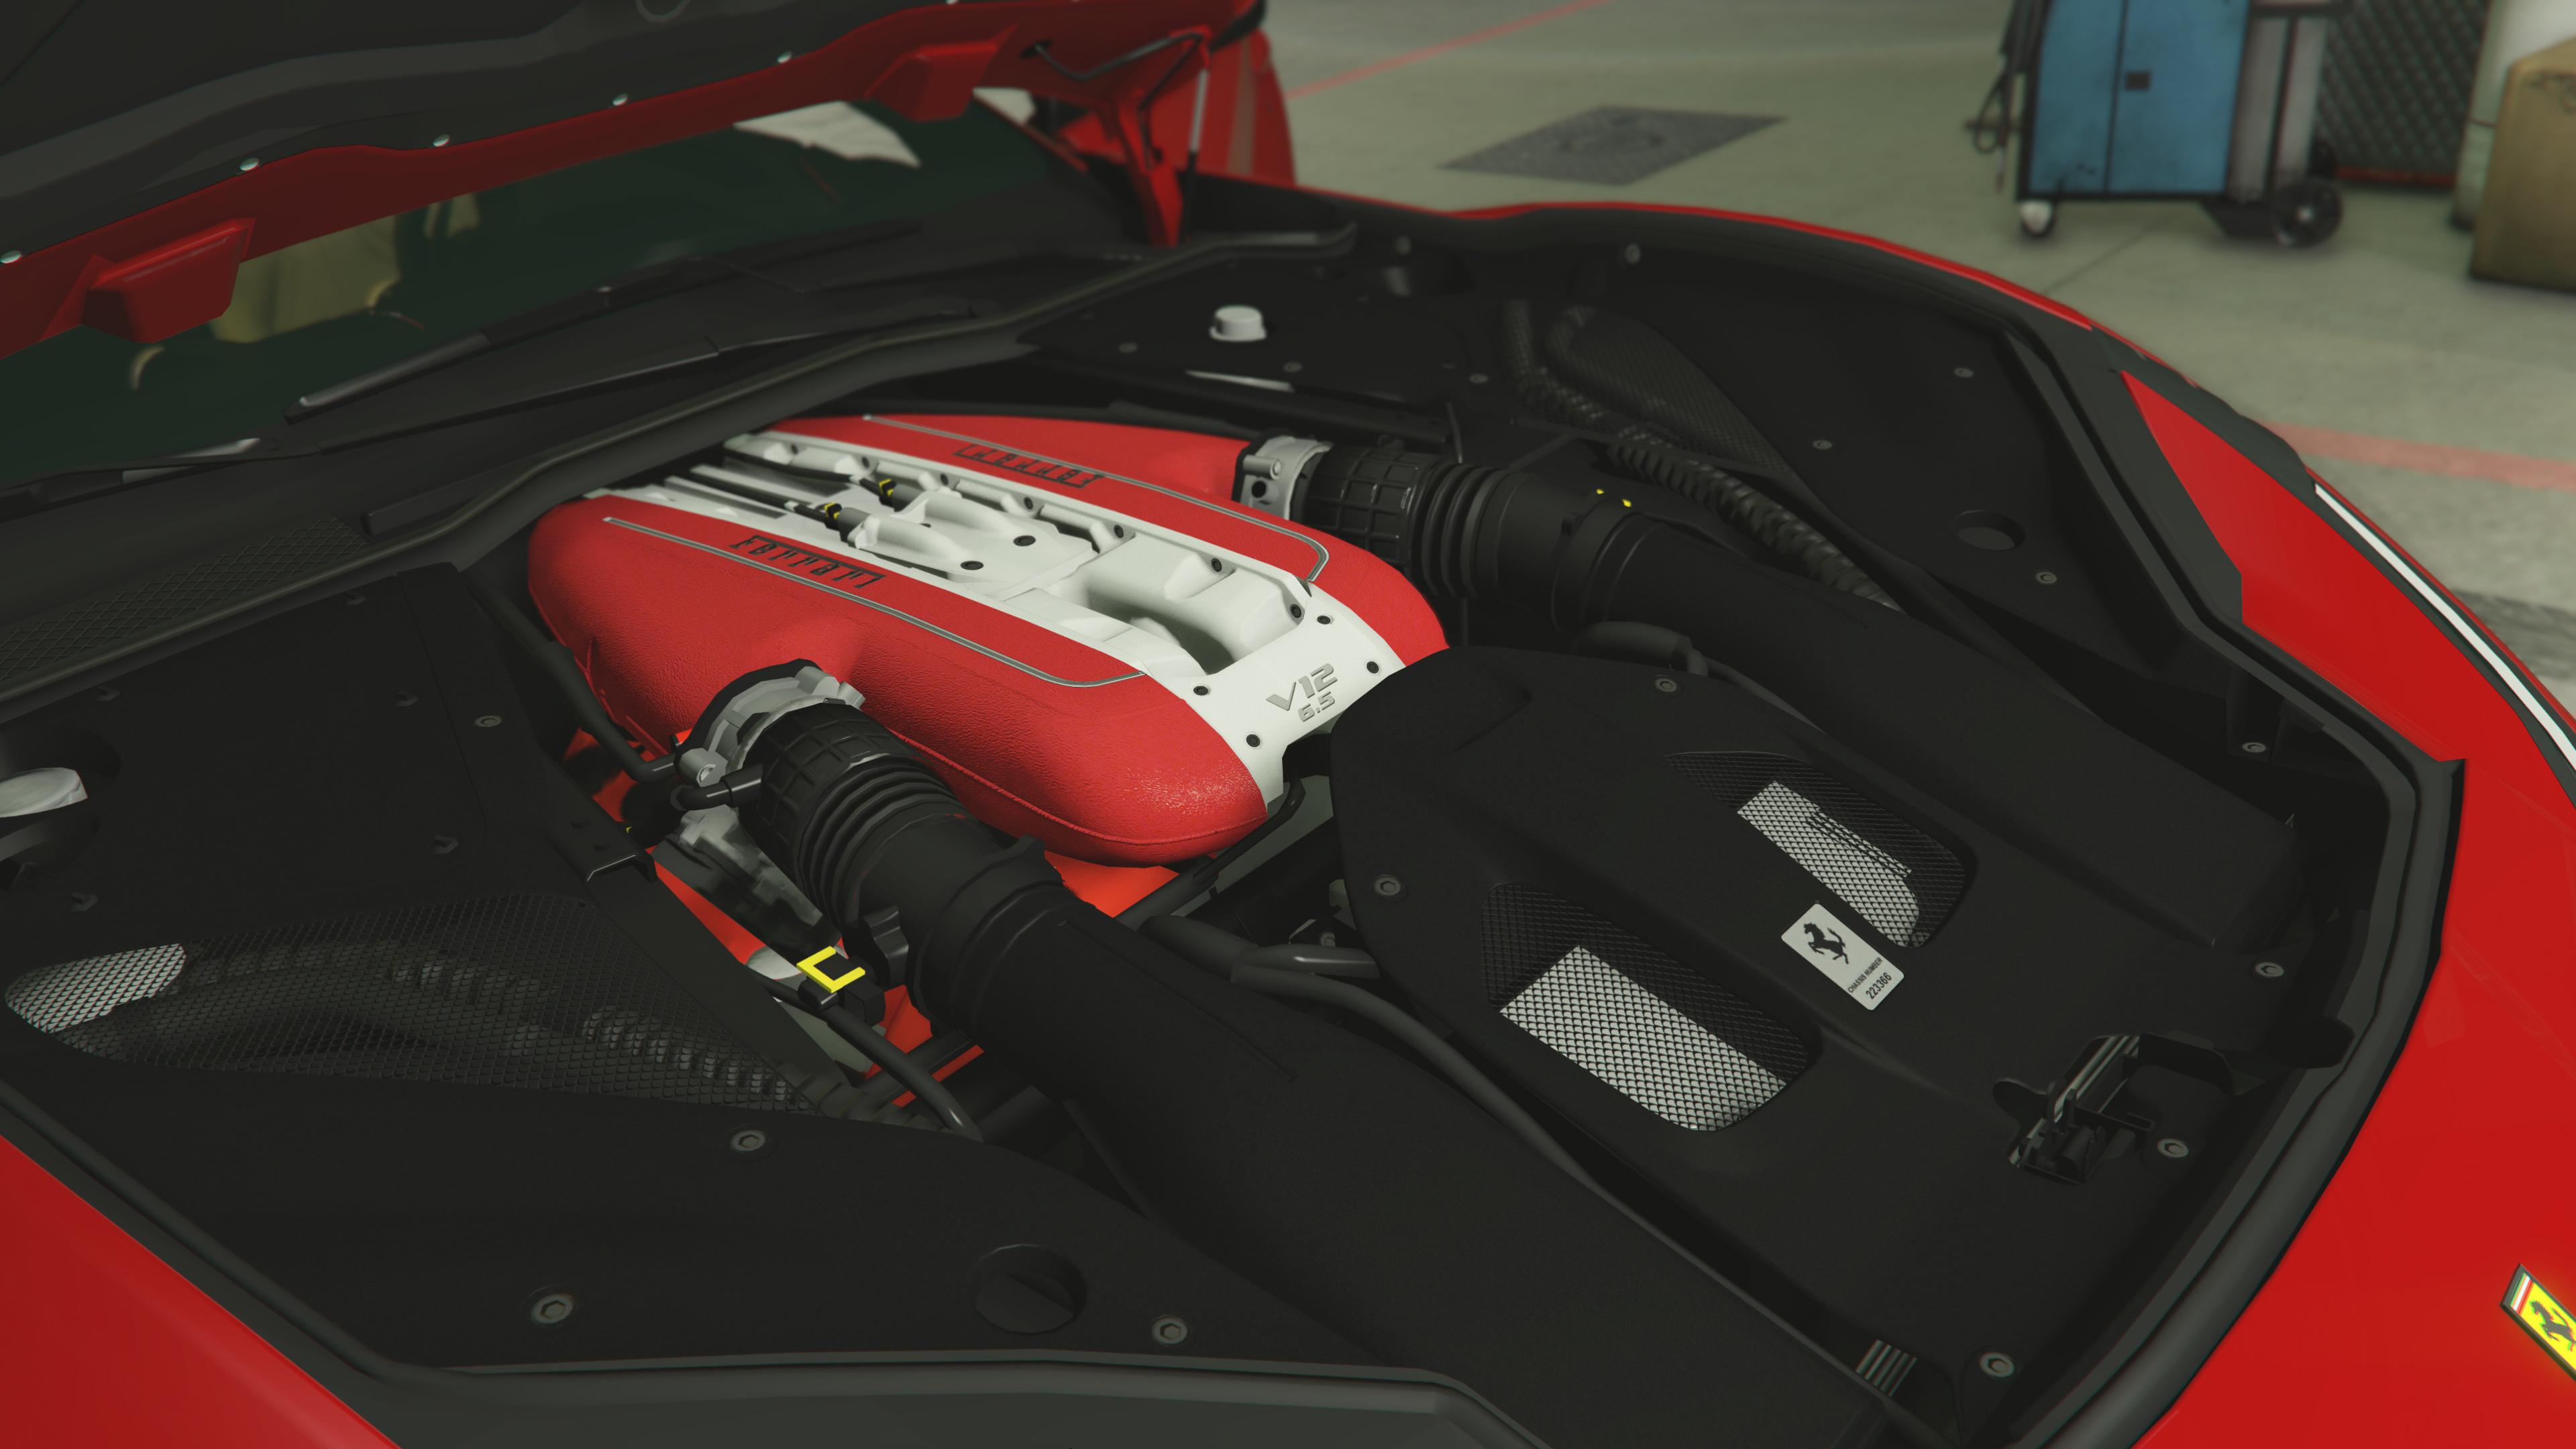 2018 ferrari 812 superfast black. Contemporary Superfast D46665 7 In 2018 Ferrari 812 Superfast Black